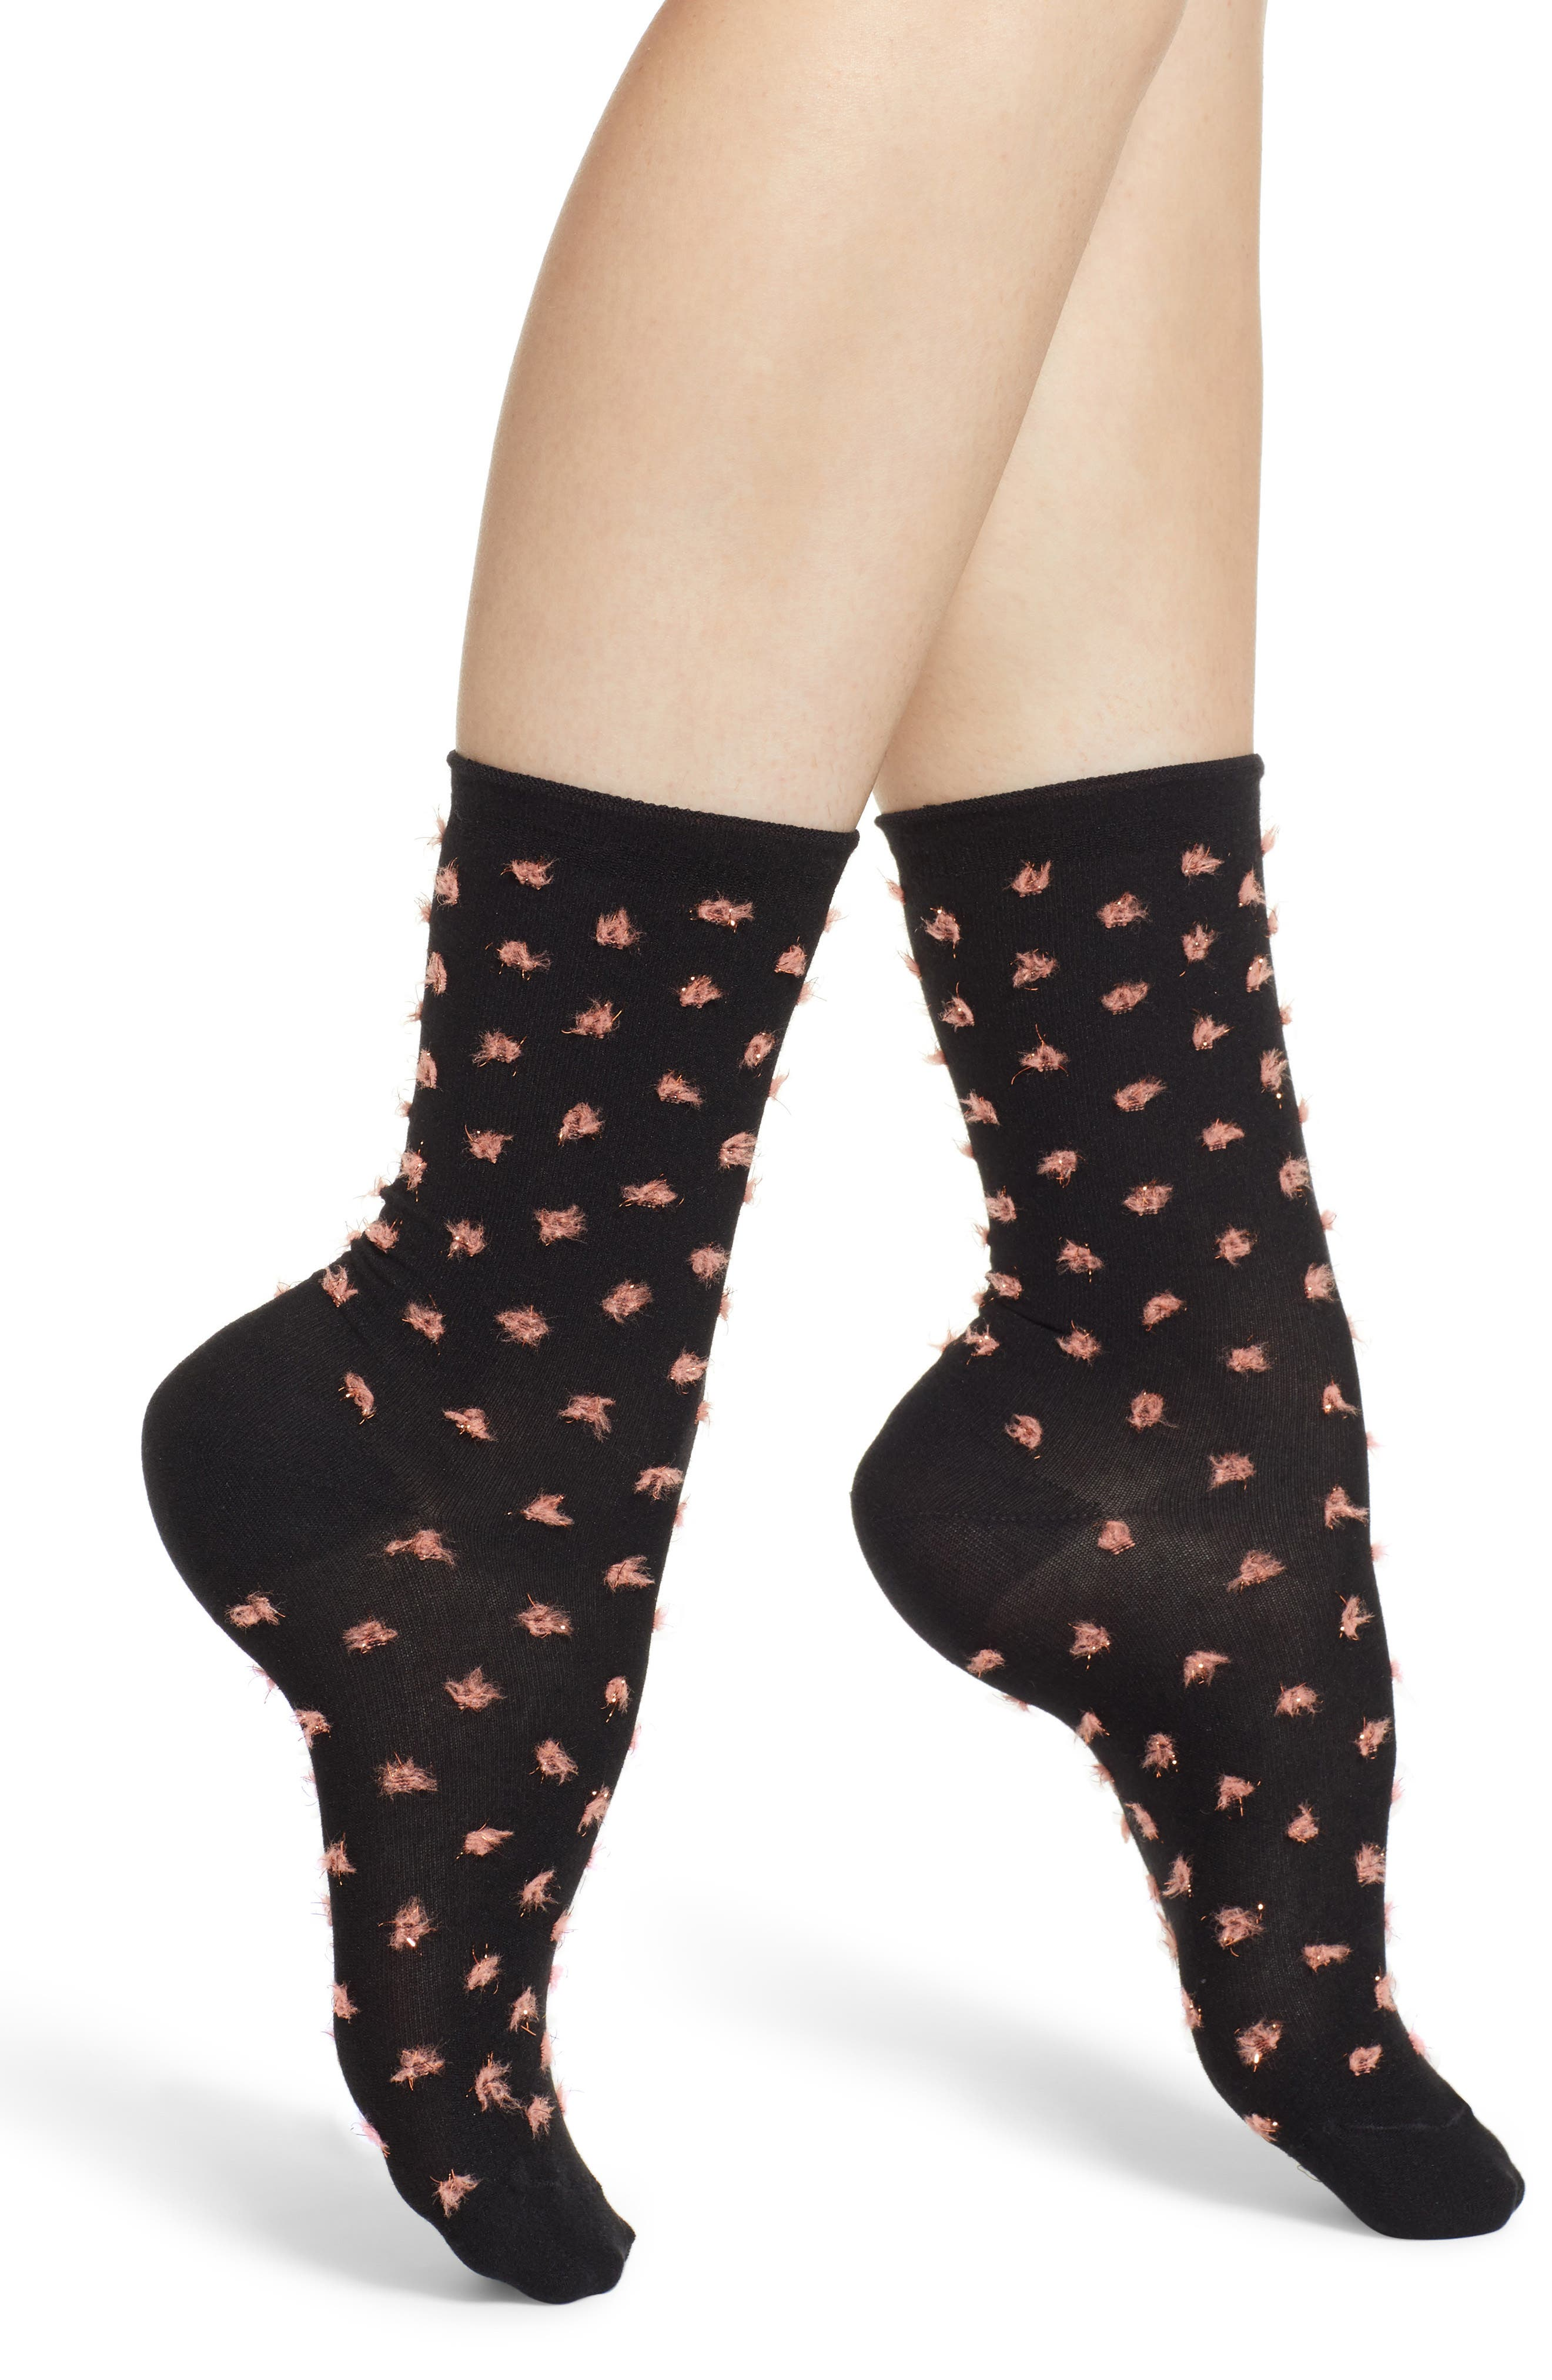 TREASURE & BOND, Inverted Rolltop Textured Crew Socks, Main thumbnail 1, color, BLACK